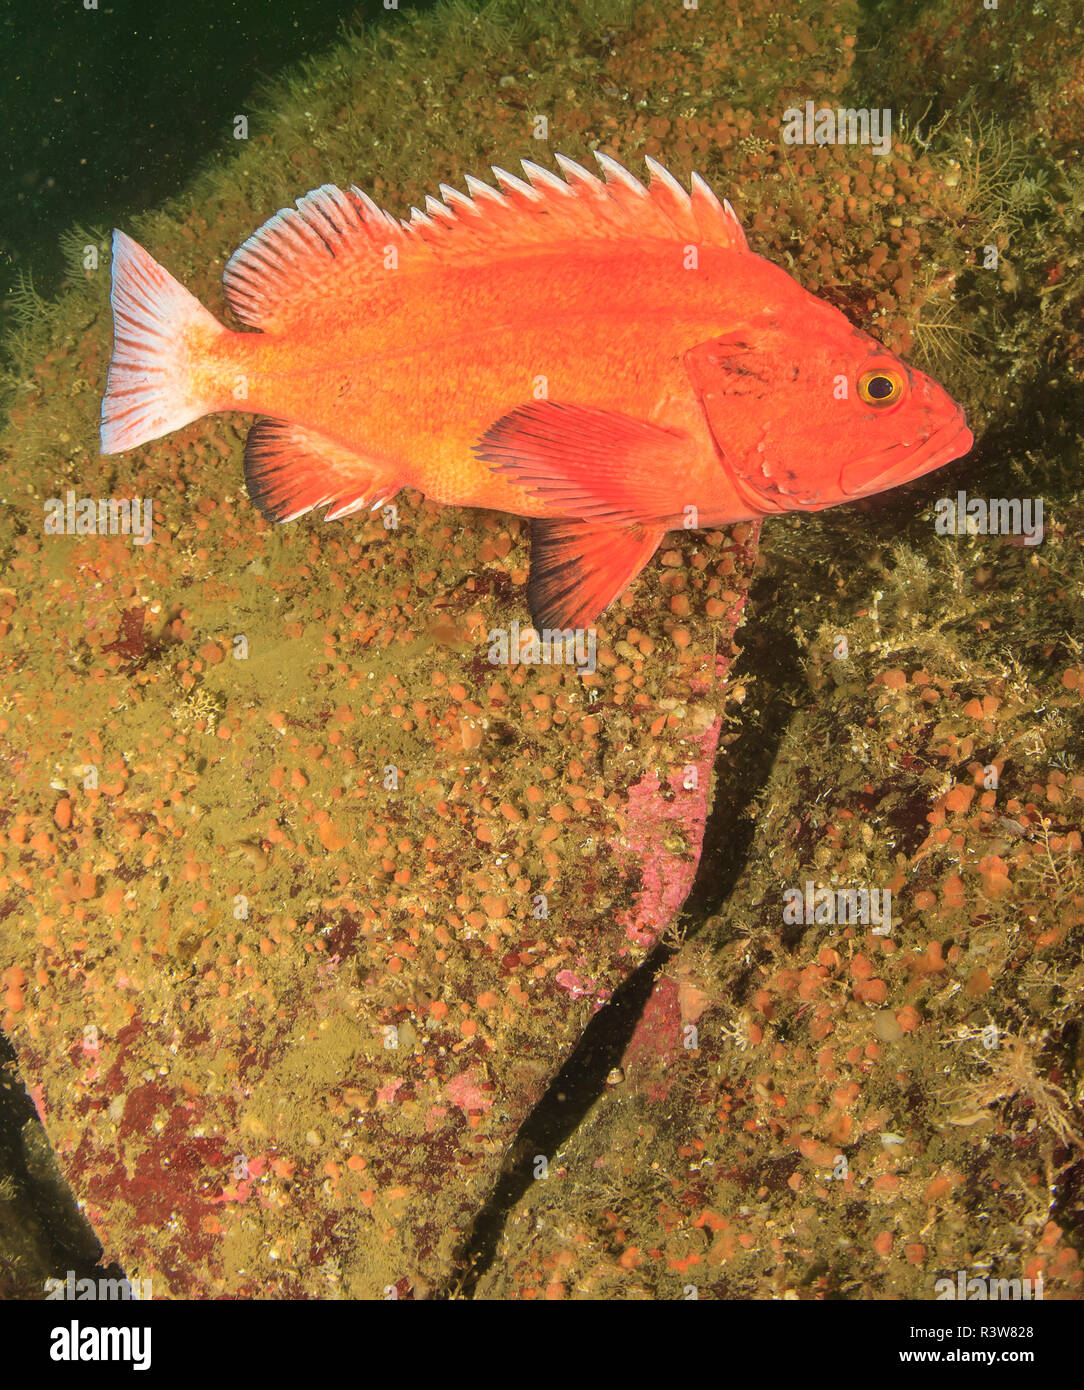 x-large Grub Morue-lingue Lure//Rockfish Leurre